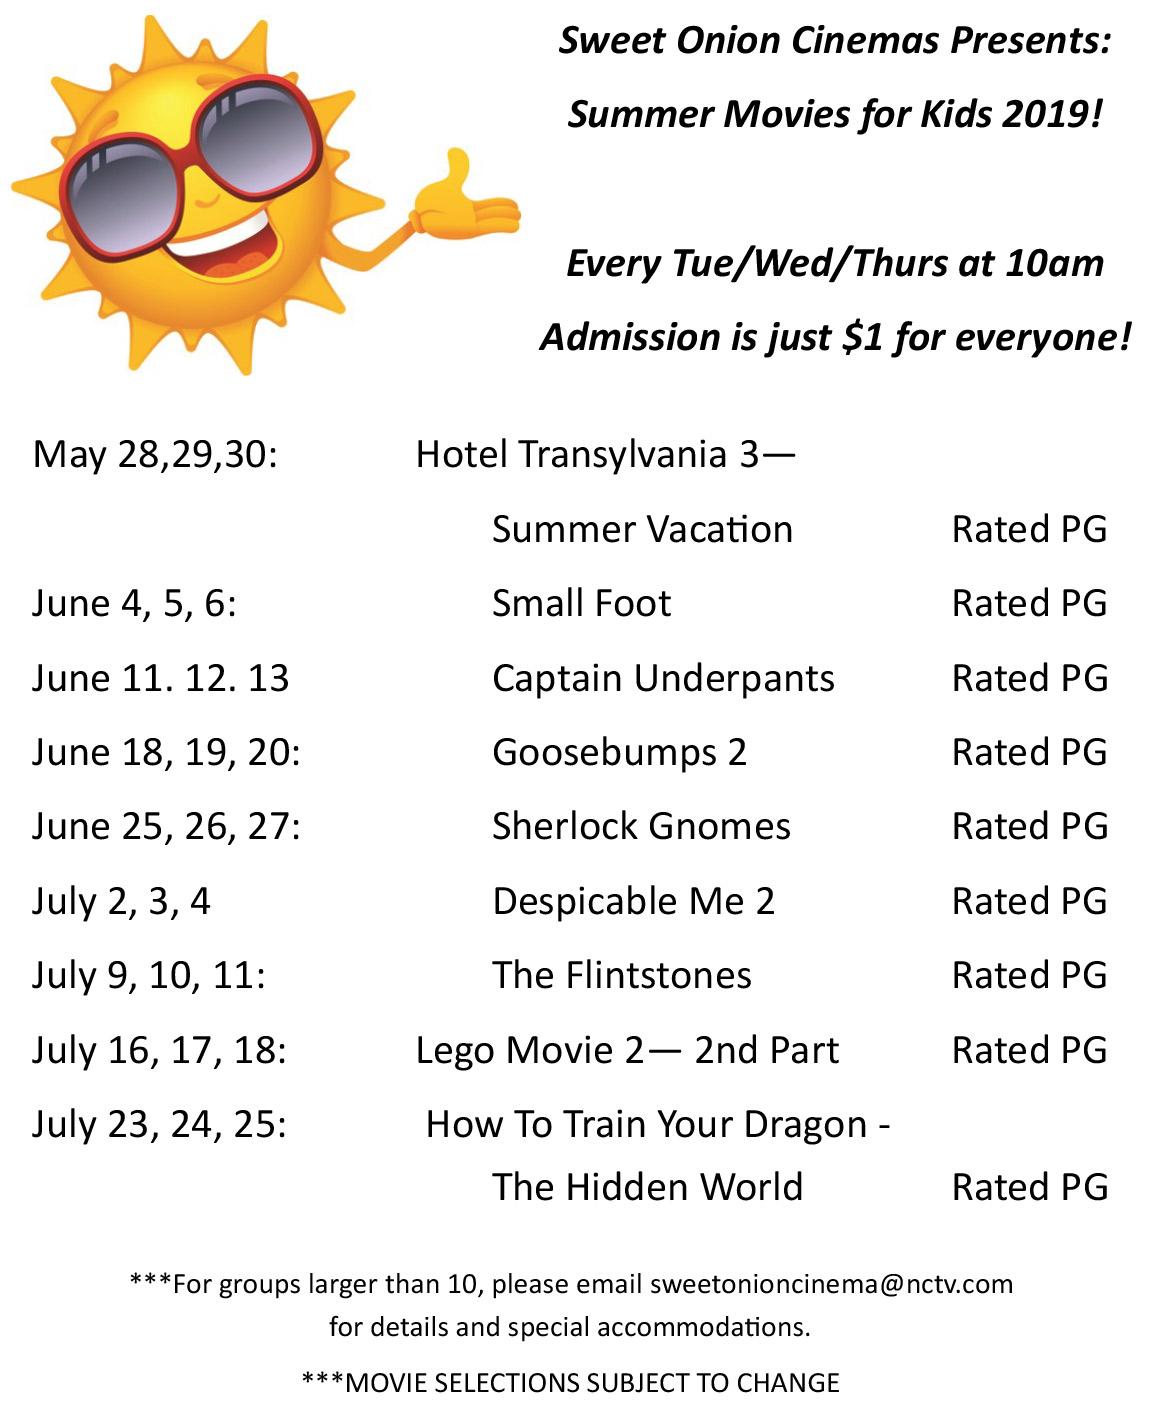 Sweet Onion Cinemas Summer Movies For Kids